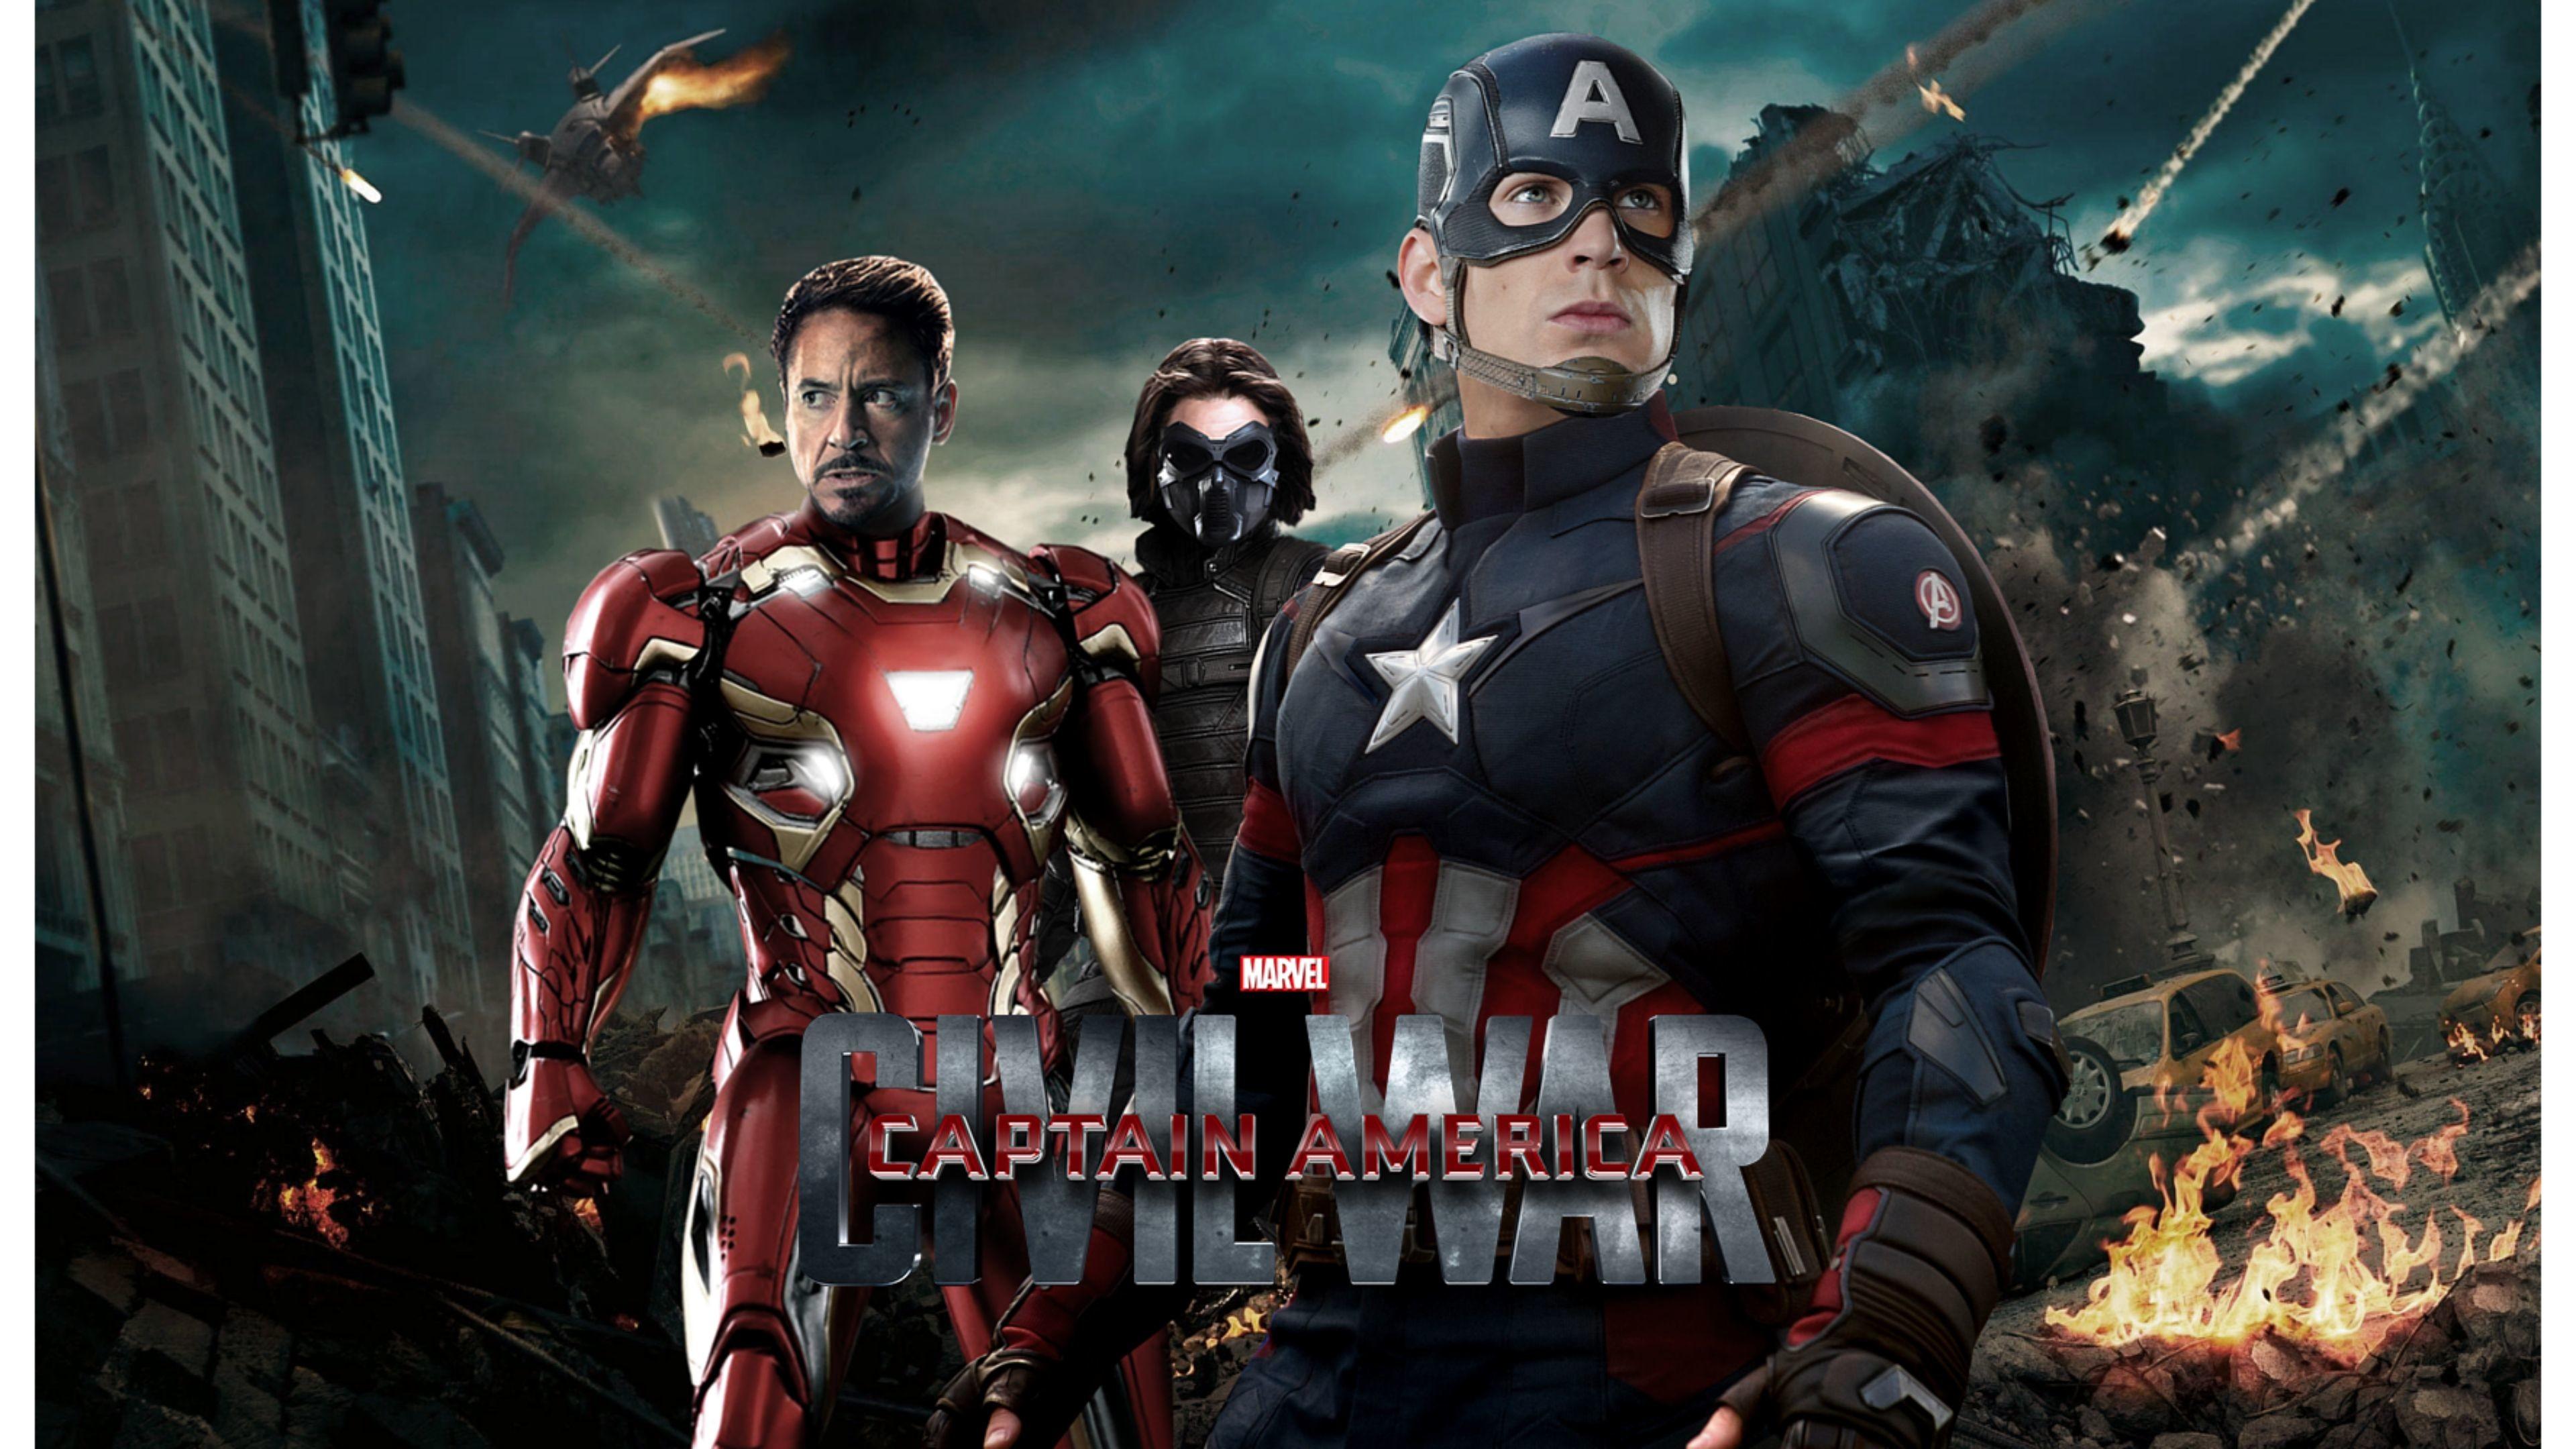 Smashing HD Wallpapers of Captain America Civil War | HD Wallpapers |  Pinterest | Captain america civil war and Wallpaper